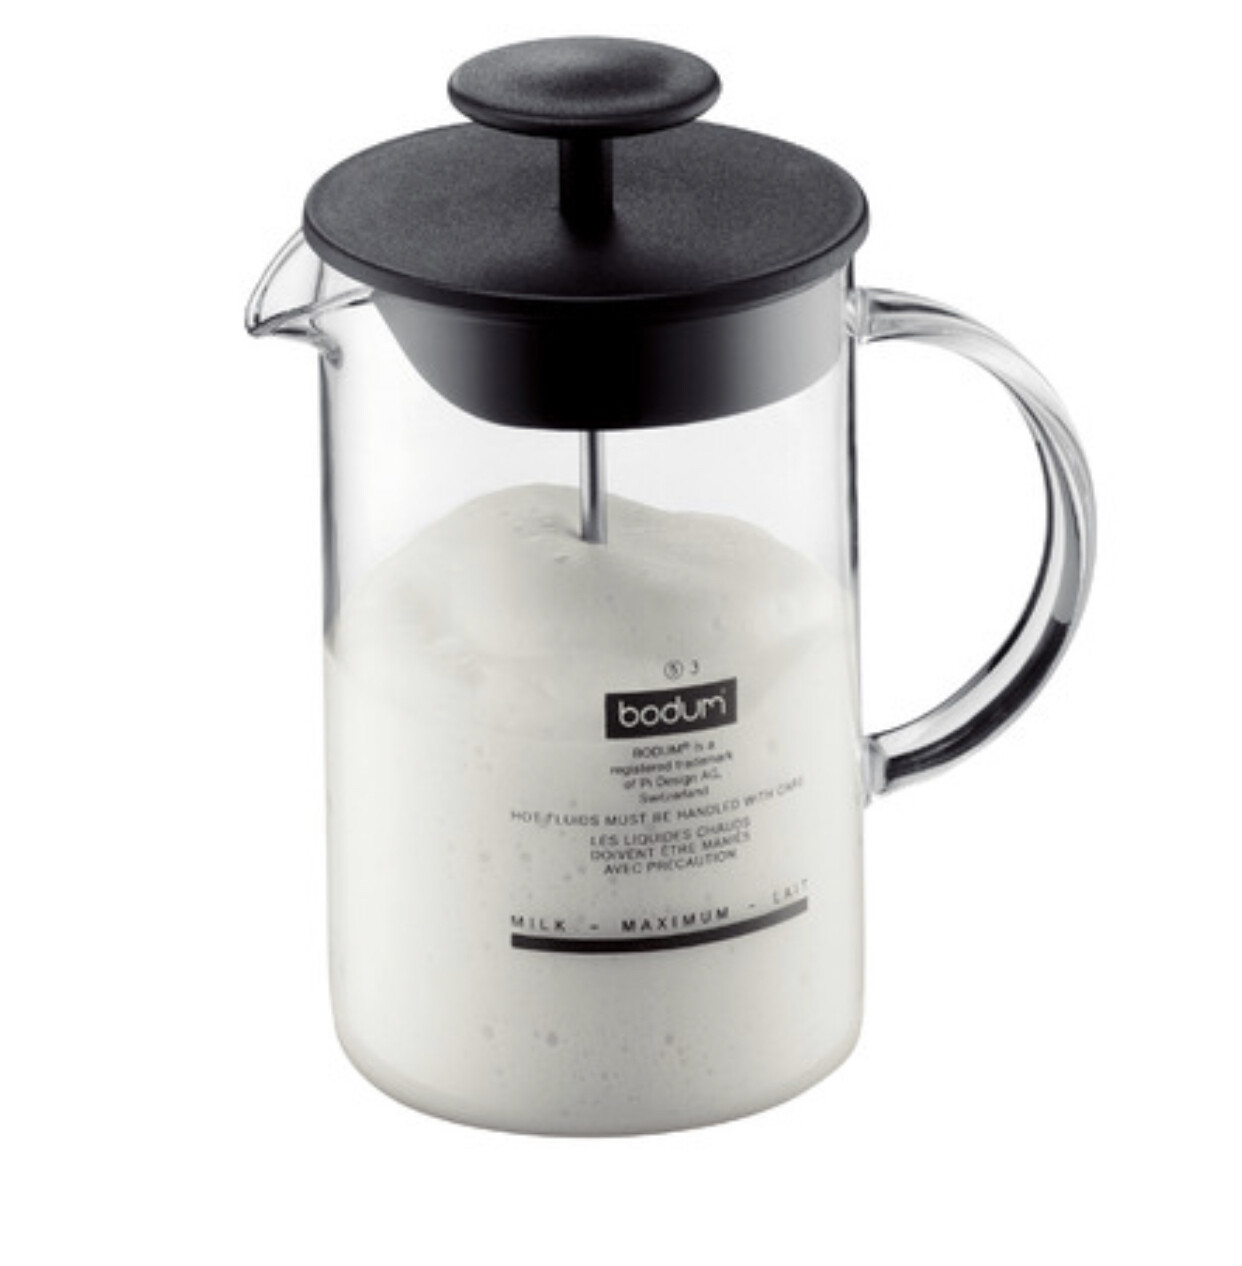 BODUM - Milk Frother Bodum